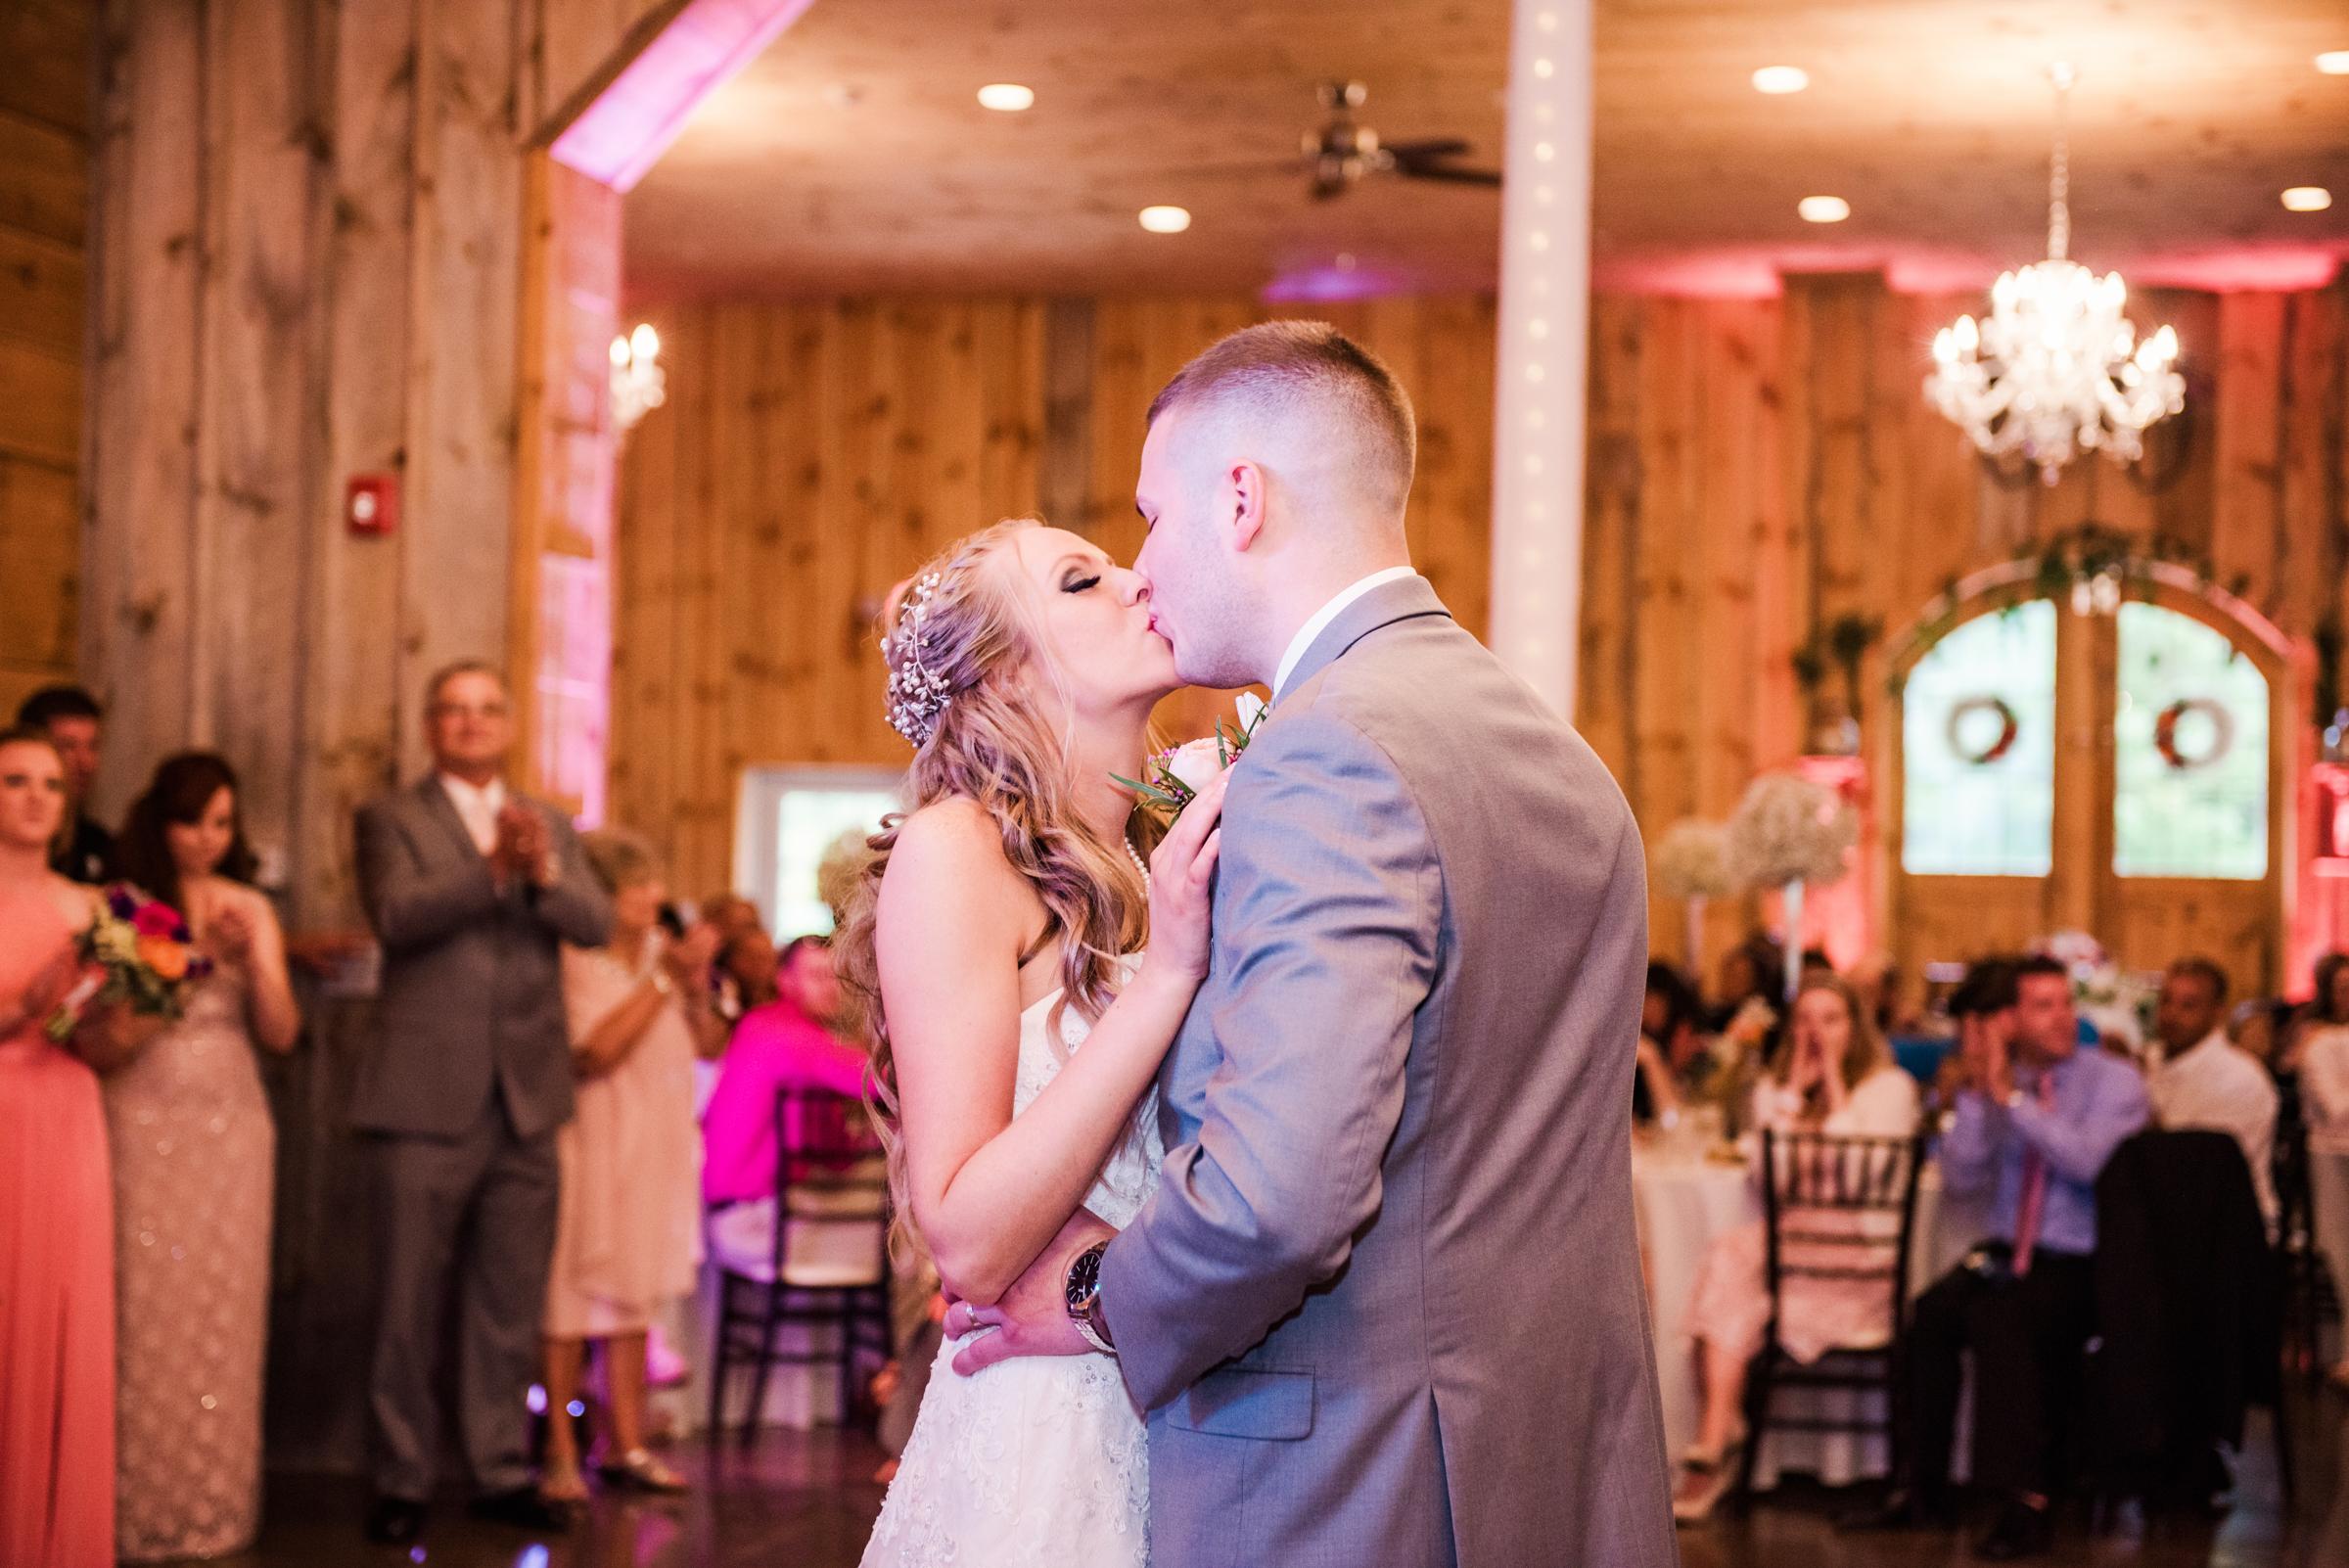 Wolf_Oak_Acres_Central_NY_Wedding_JILL_STUDIO_Rochester_NY_Photographer_DSC_8896.jpg